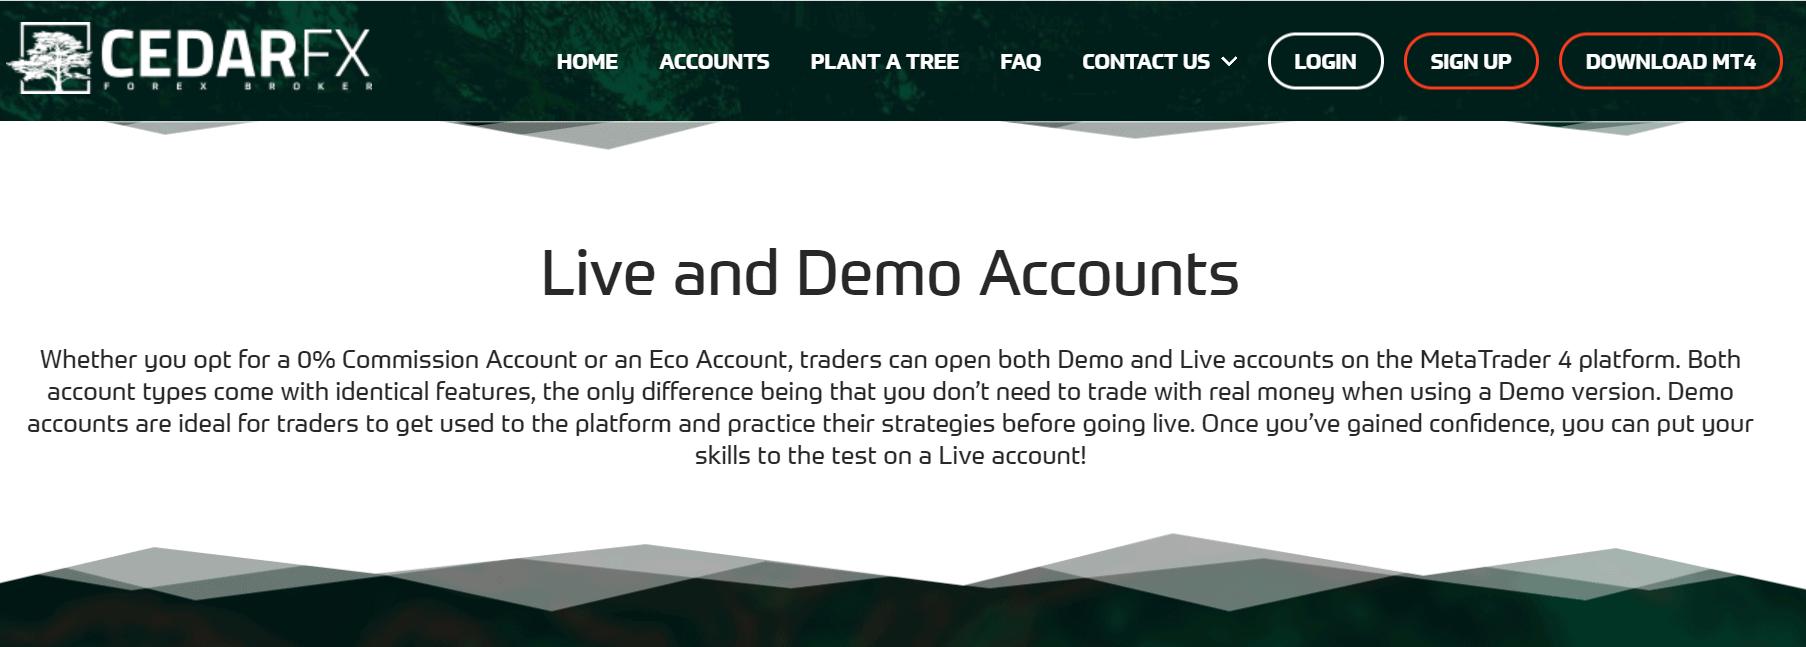 cedarfx demo account